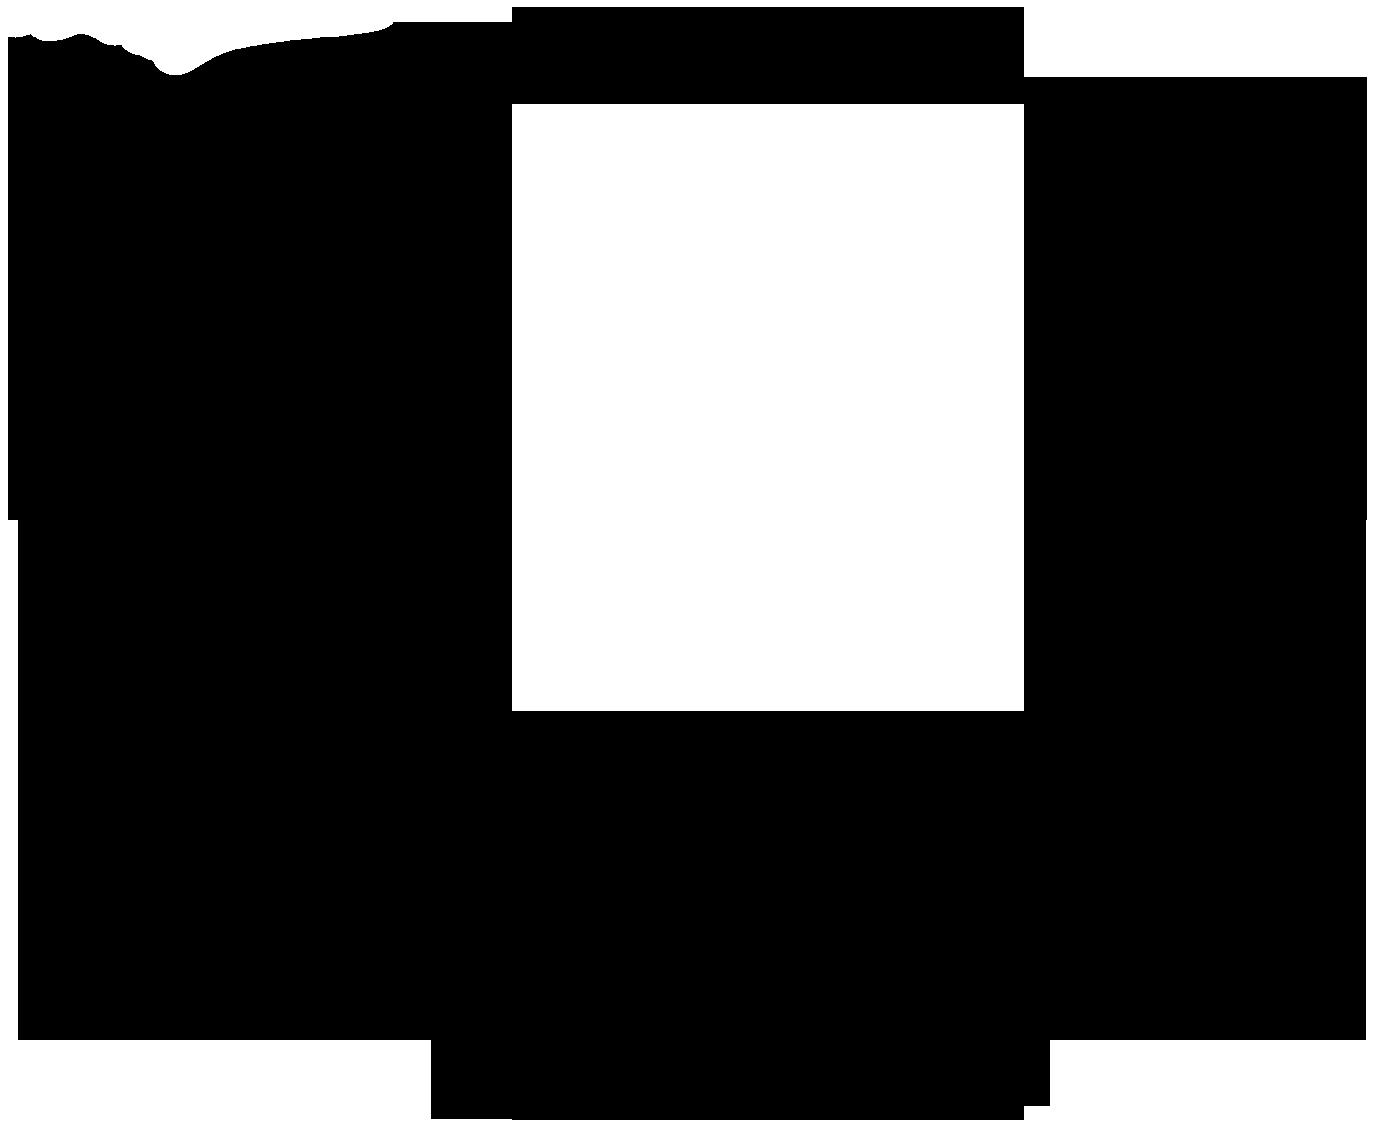 1377x1137 Clip Art Black And White Cake Clipart